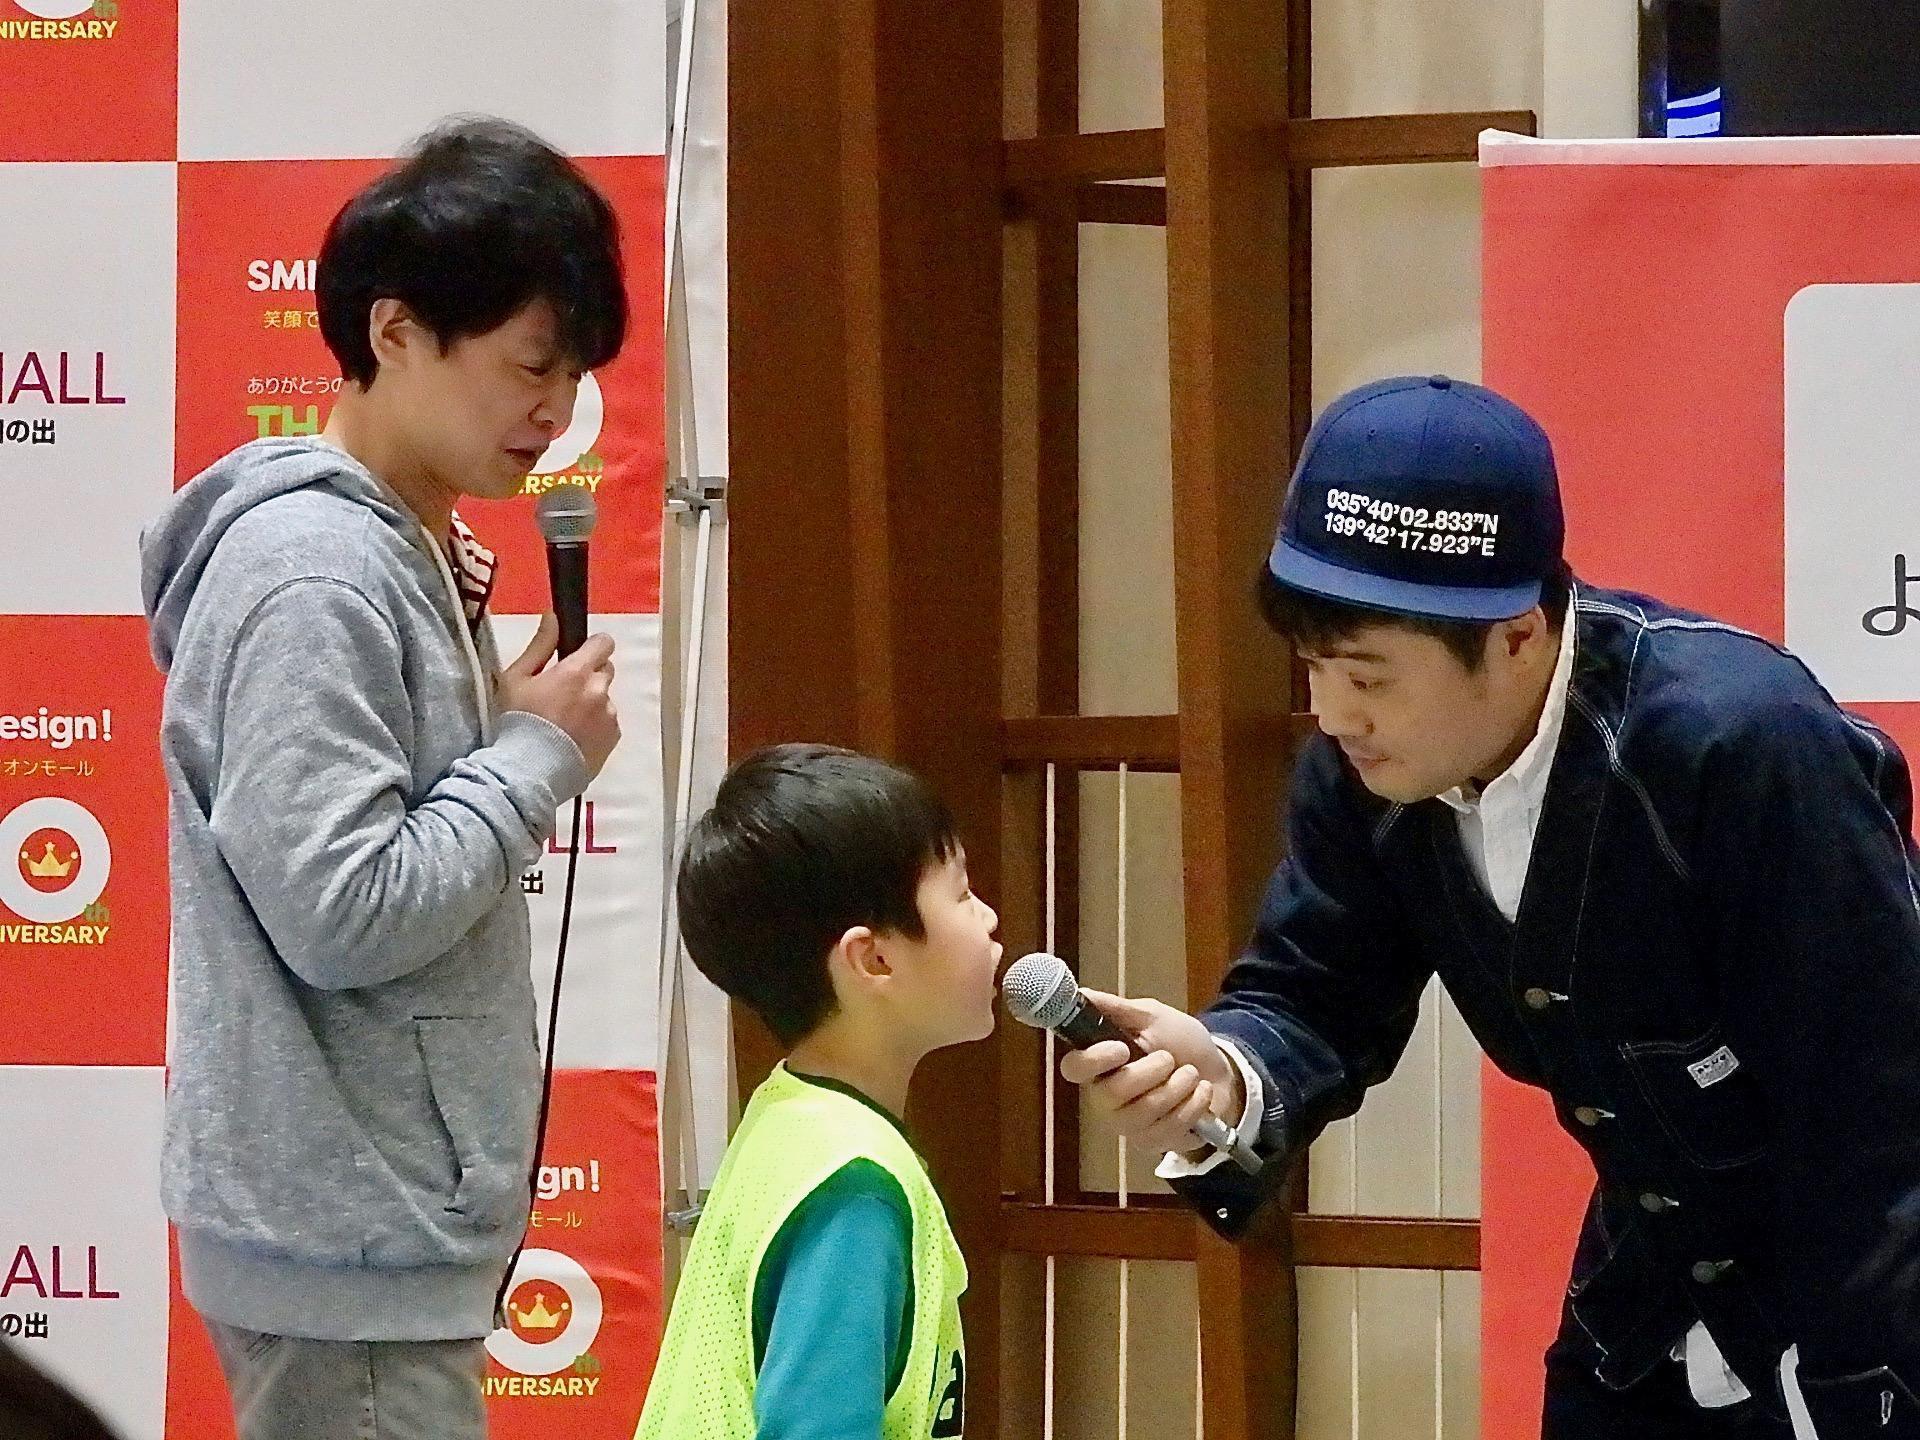 http://news.yoshimoto.co.jp/20180211194907-bcb908f565bf543c243a6496b90ce1af8a563c48.jpg